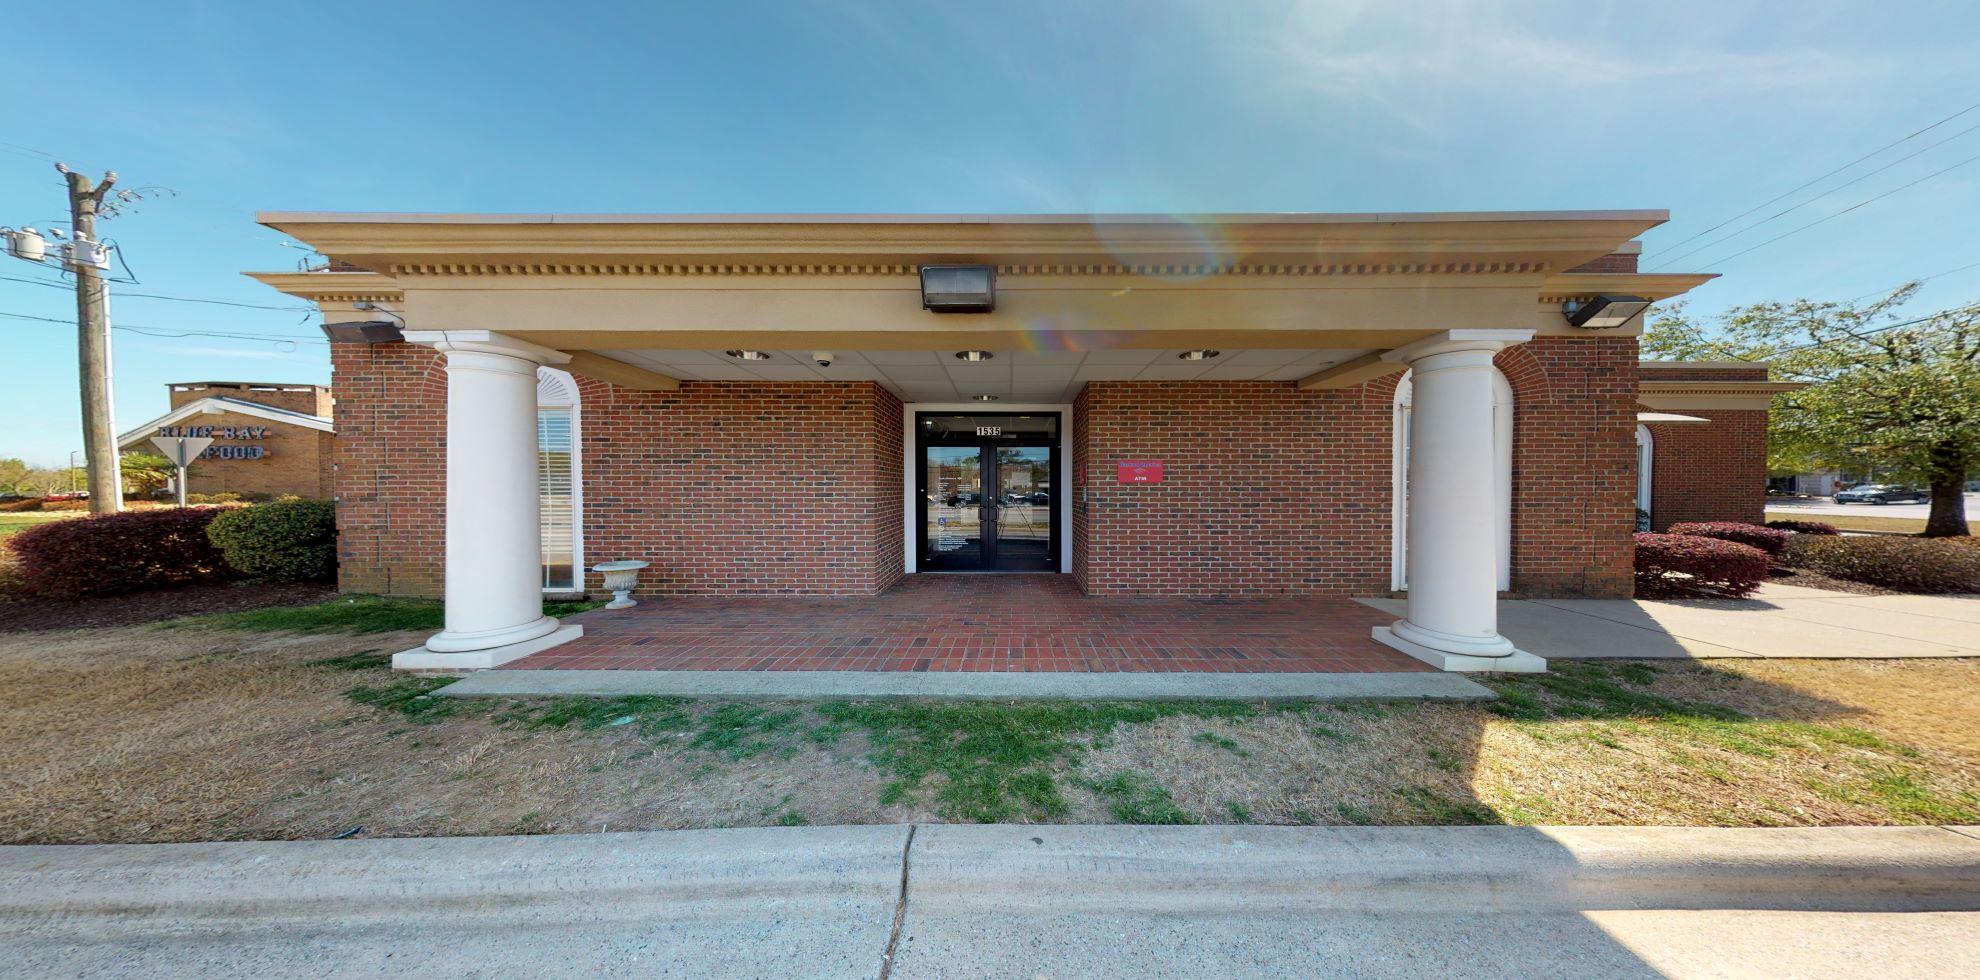 Bank of America financial center with drive-thru ATM and teller   1535 John B White Sr Blvd, Spartanburg, SC 29301